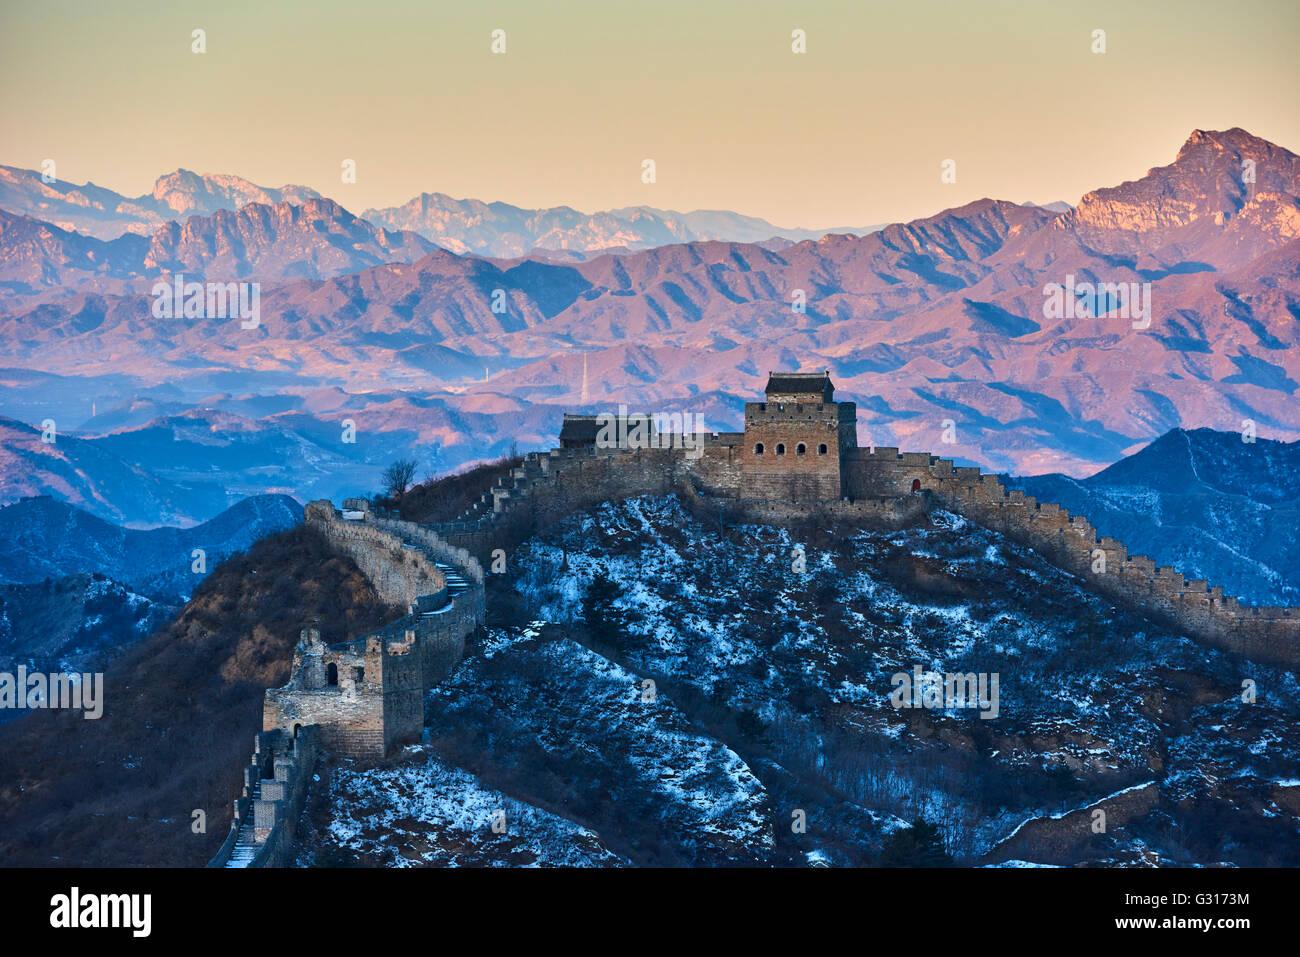 Chine, province de Hebei, Grande Muraille de Chine, la section de Simatai et Jinshanling, UNESCO World Heritage Photo Stock